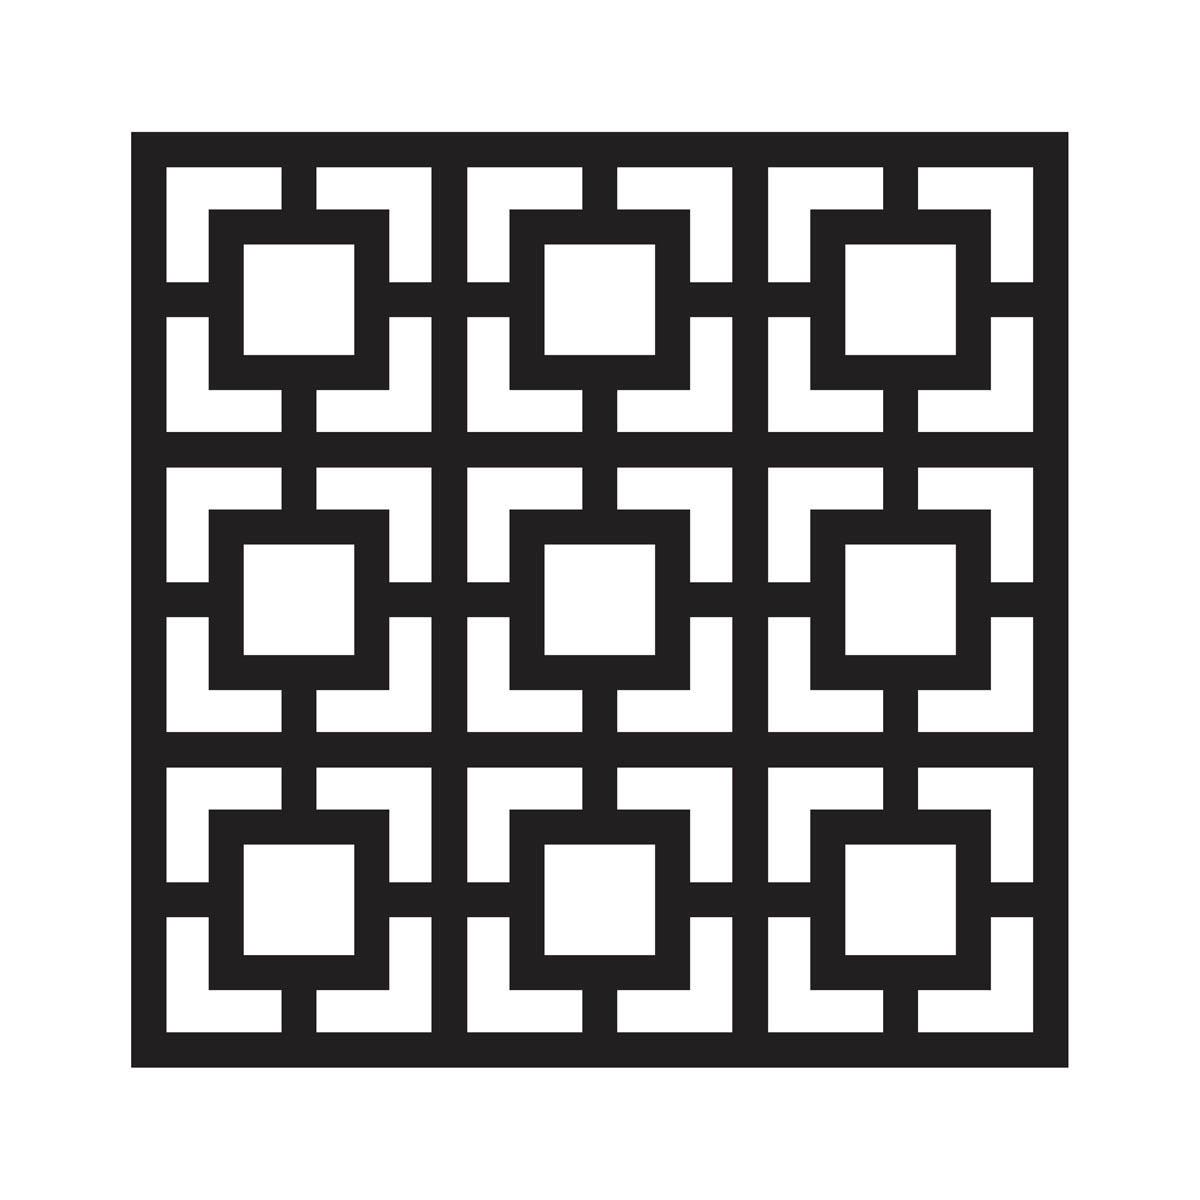 FolkArt ® Painting Stencils - Large - Square Revival - 4379